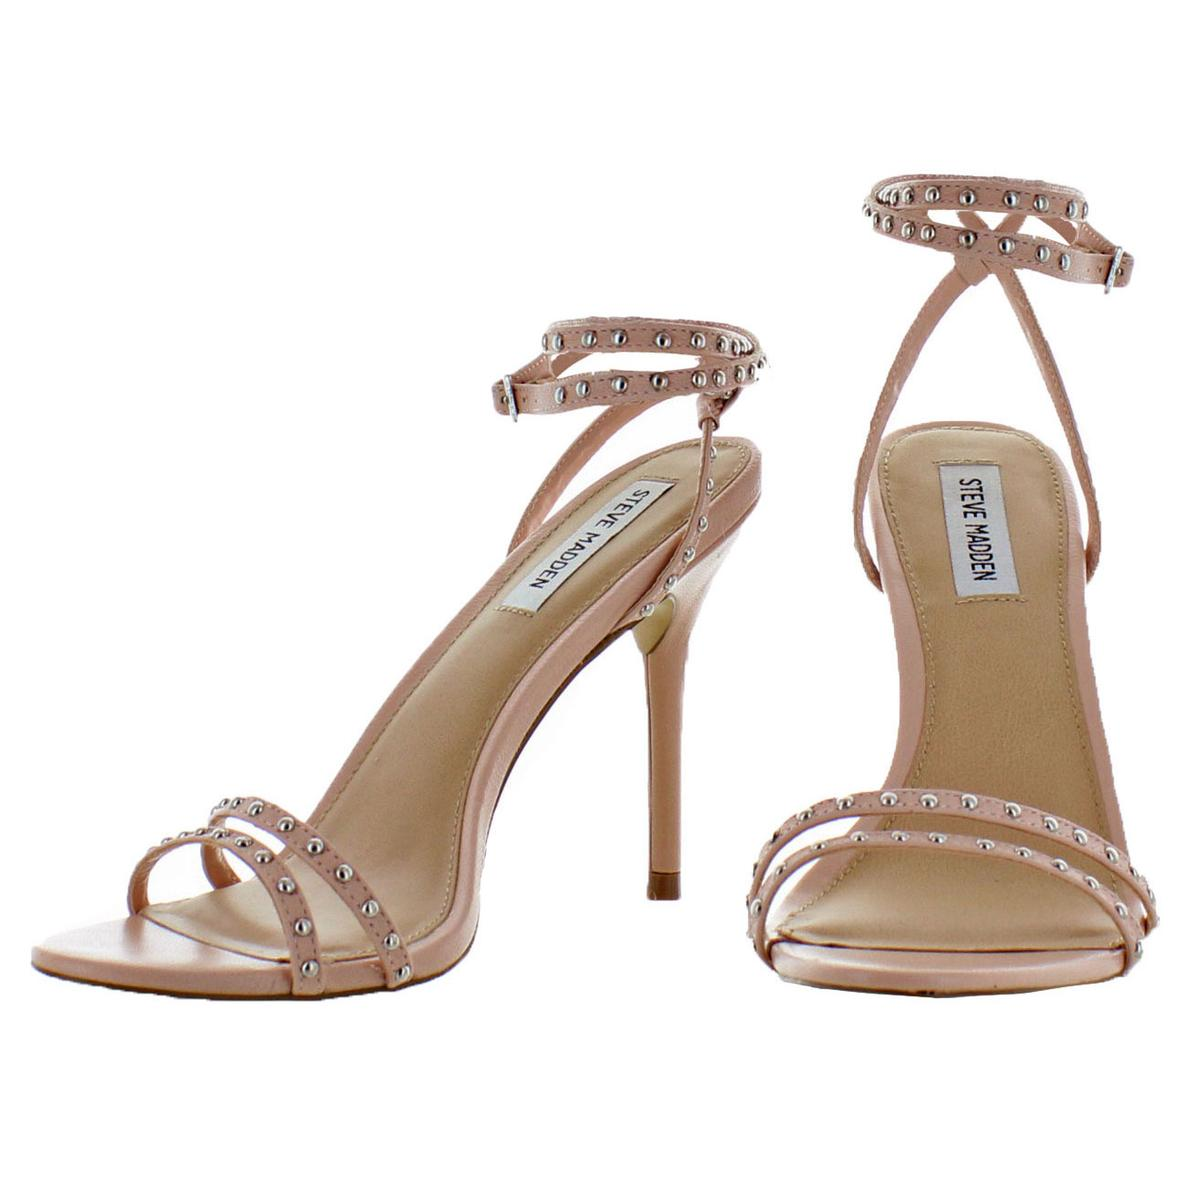 Steve-Madden-Womens-Wish-Leather-Heels-Stiletto-Sandals-Shoes-BHFO-6930 thumbnail 8